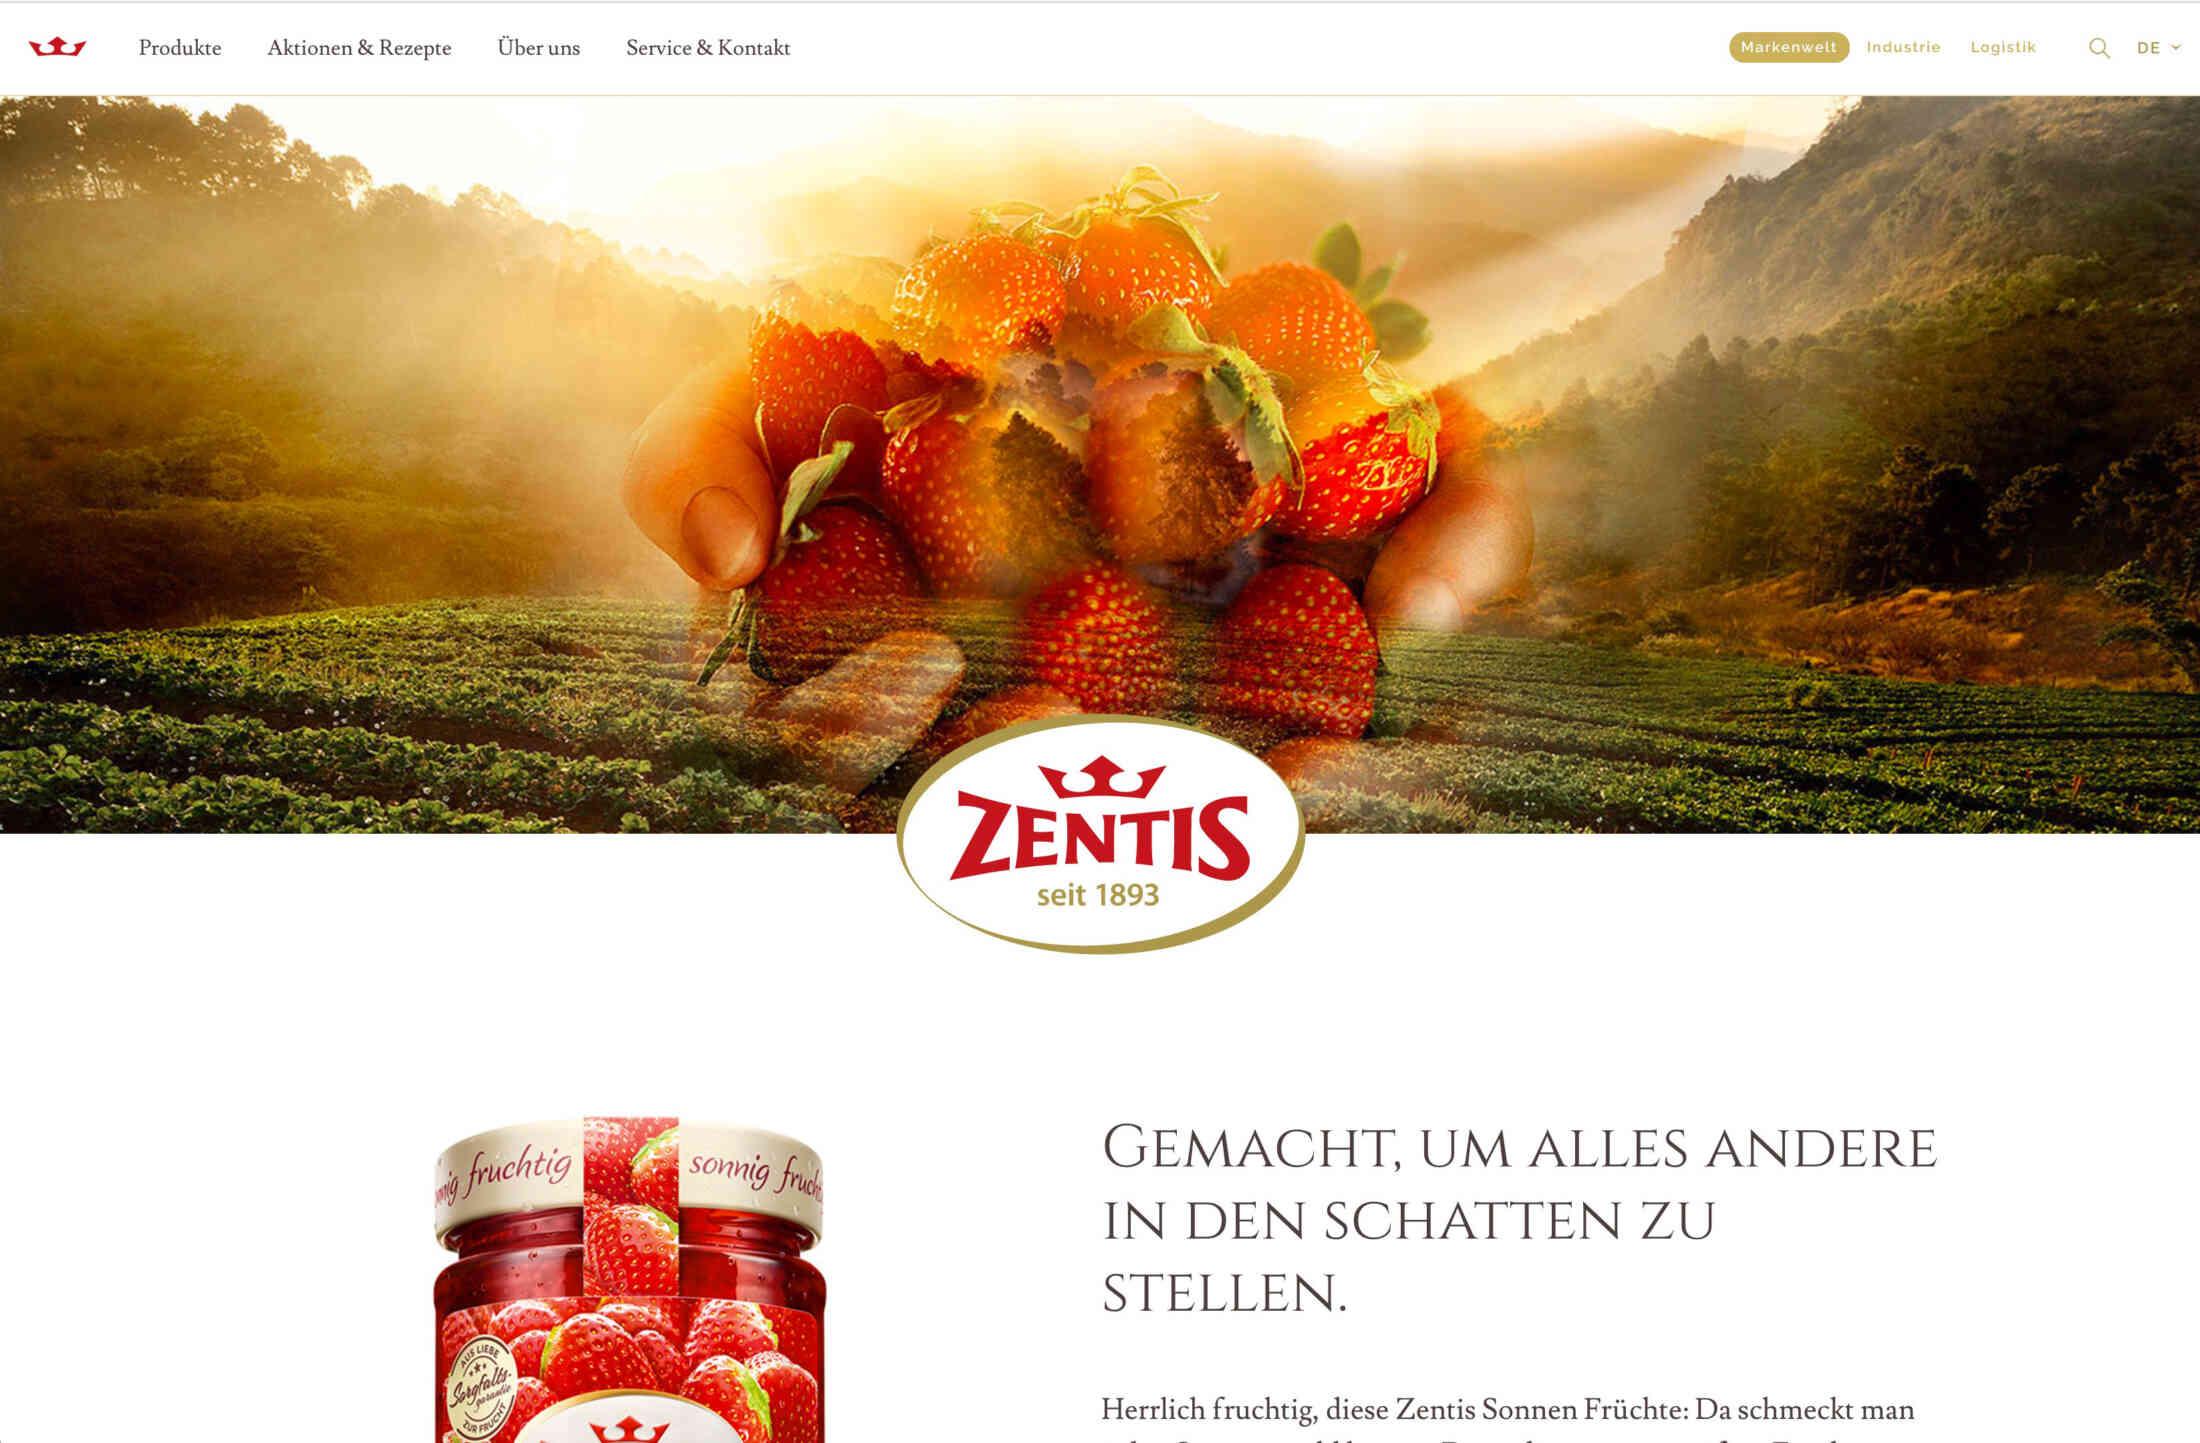 https://www.elfacht.com/uploads/portfolio/_portfolioHd/portfolio_zentis.jpg